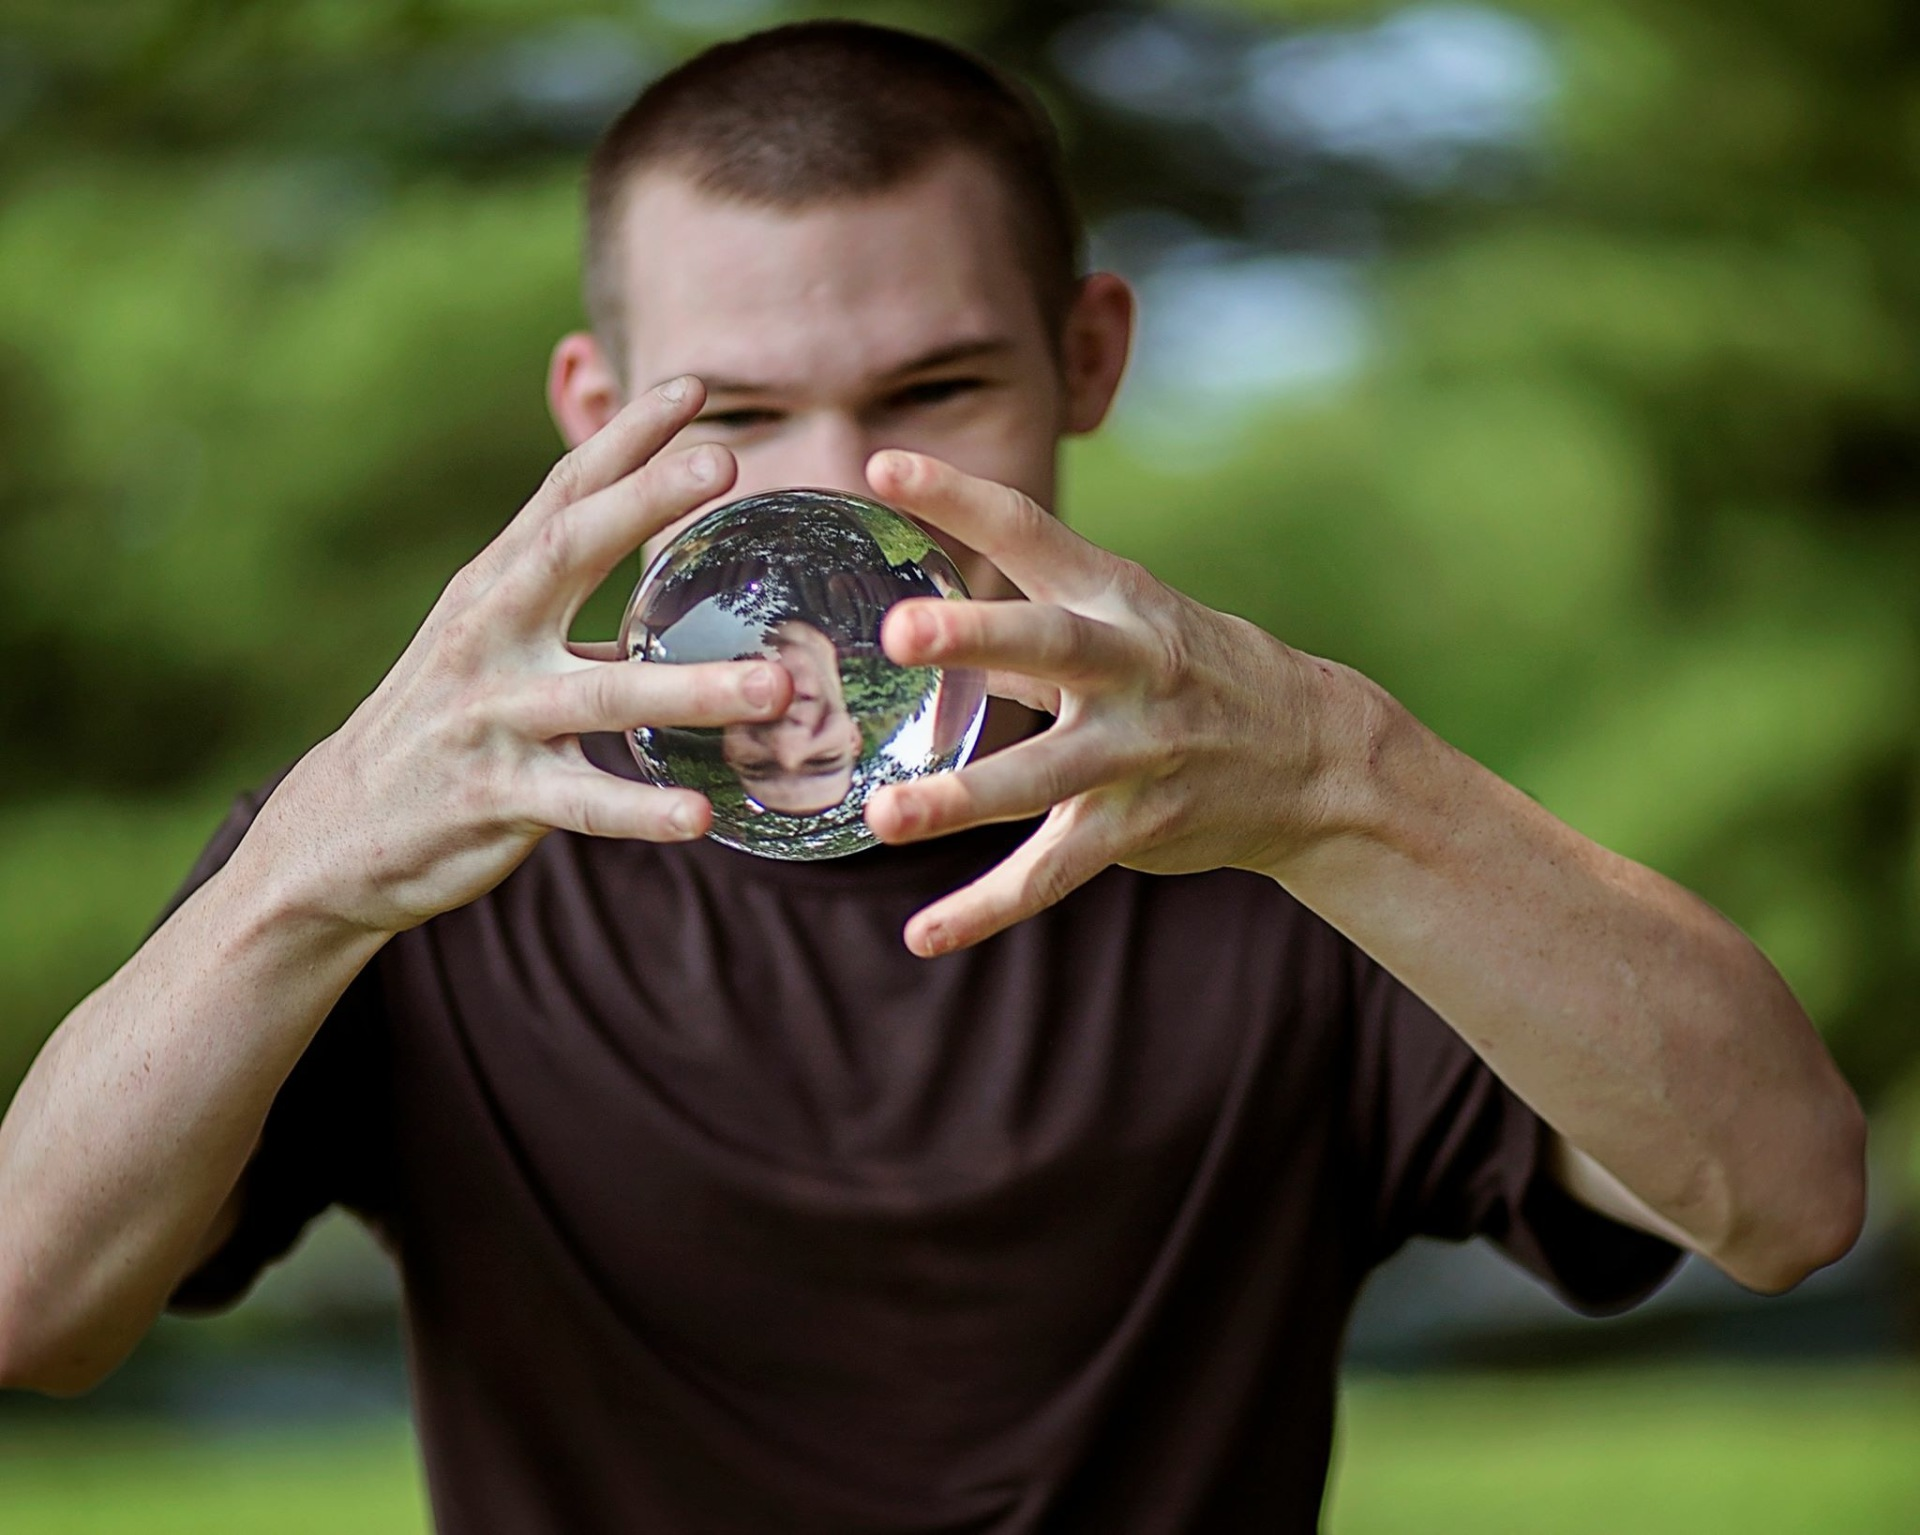 Juggling and Flow Arts Morgantown, WV